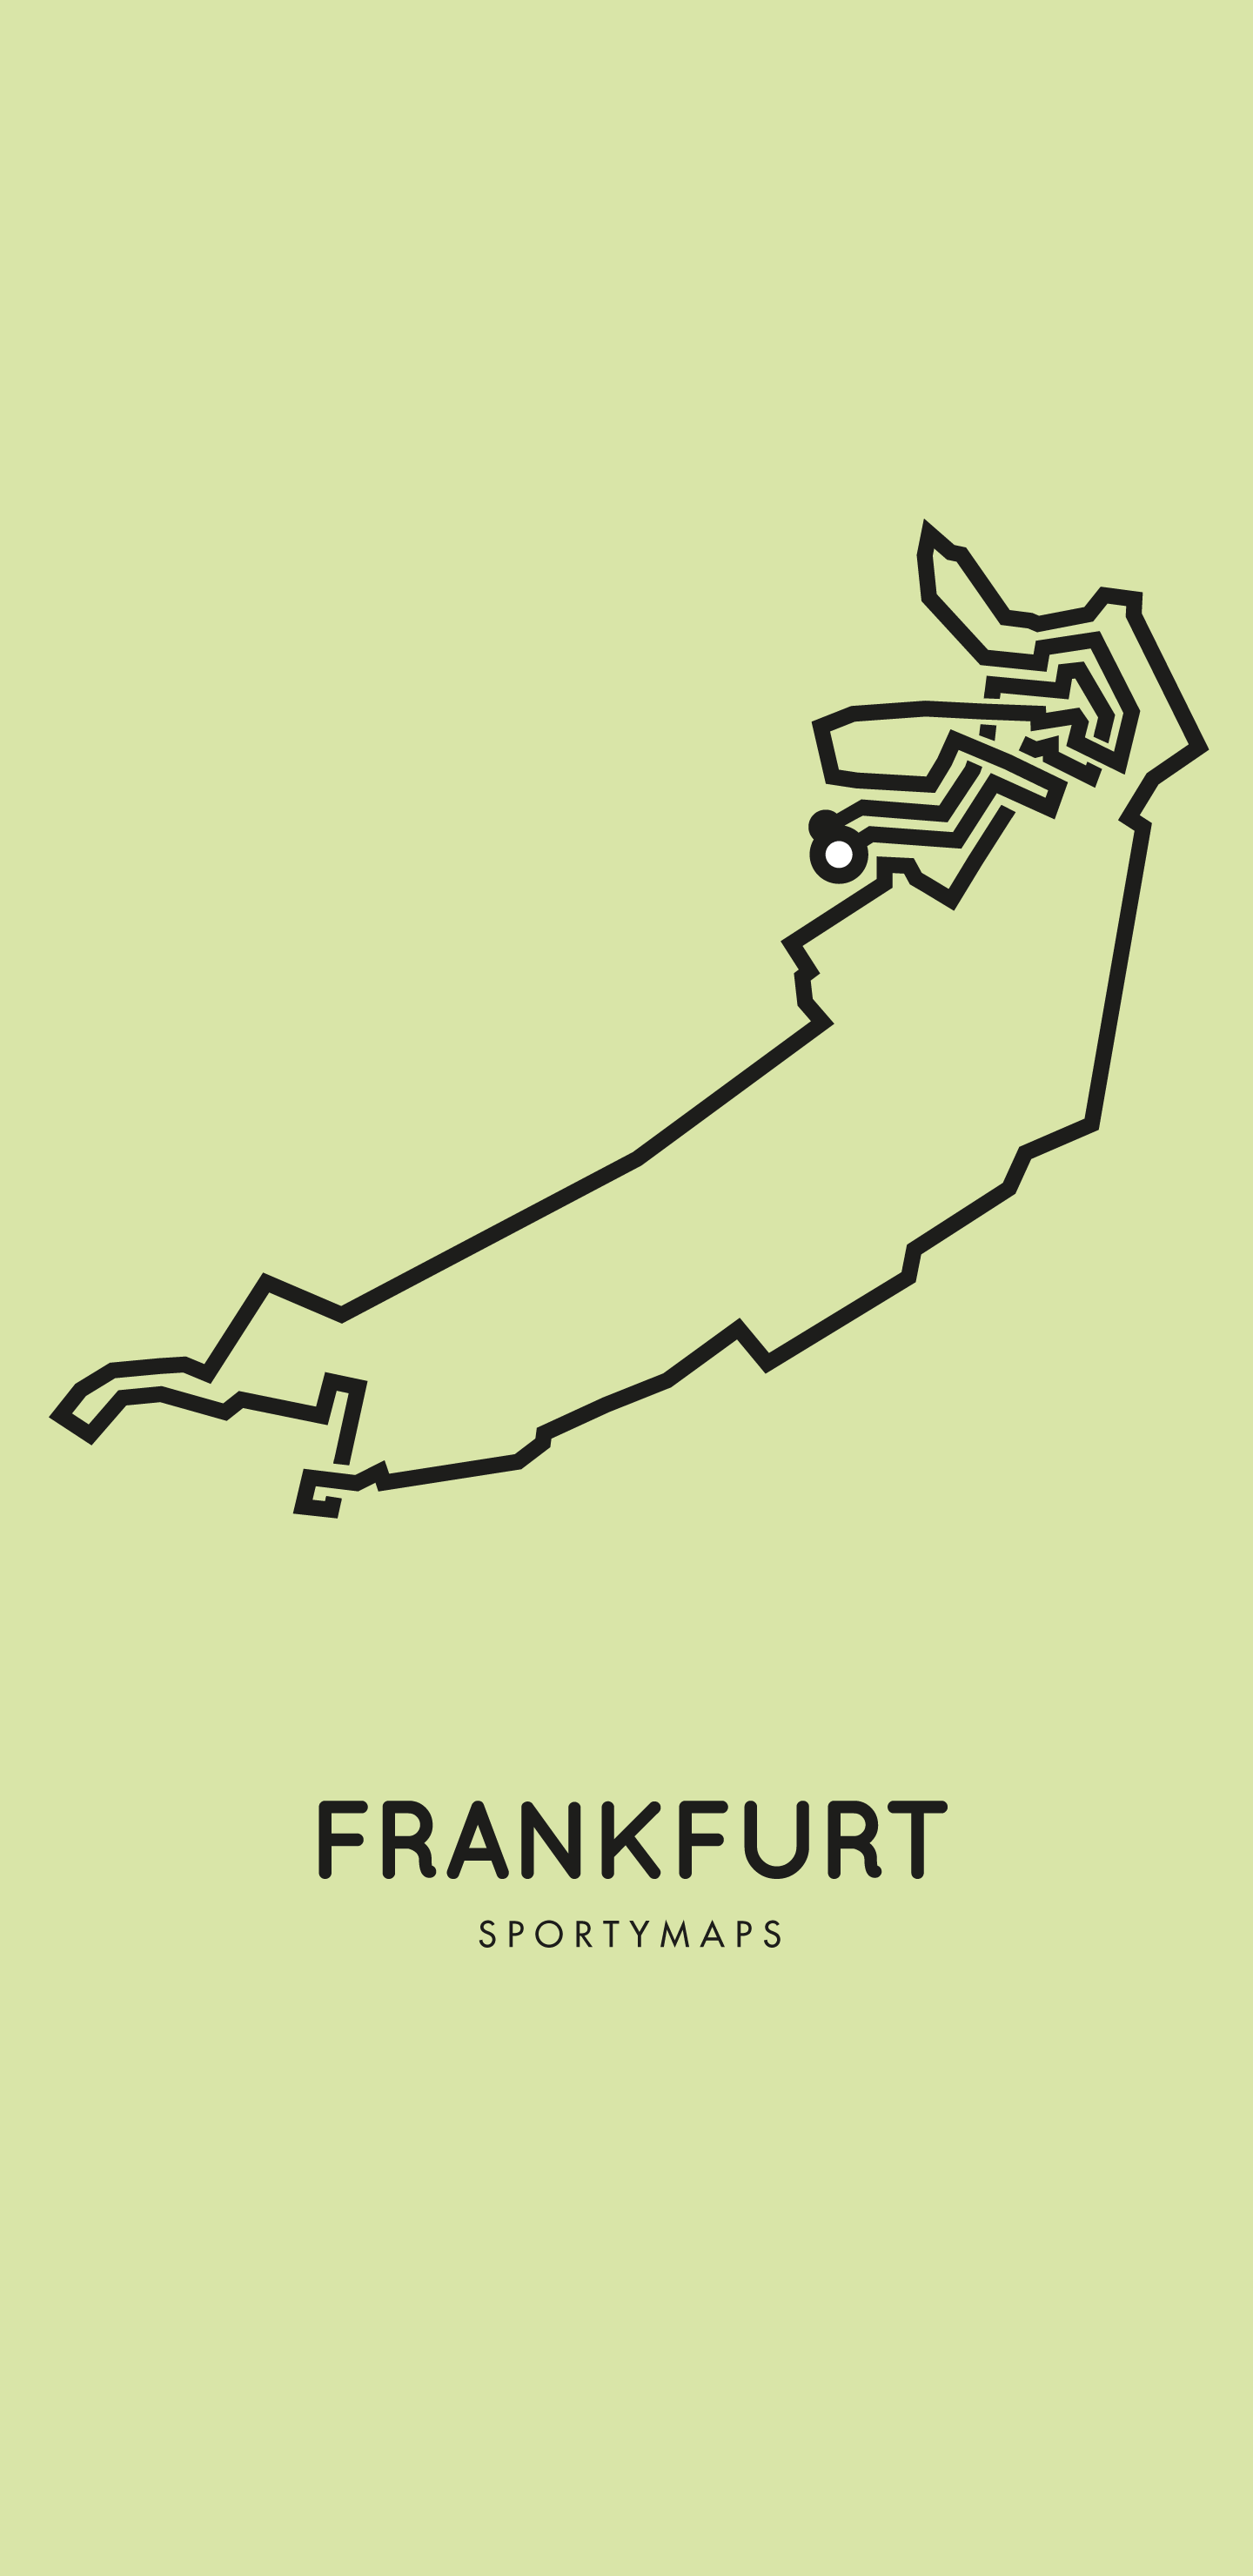 Sportymaps-Frankfurt-marathon-green